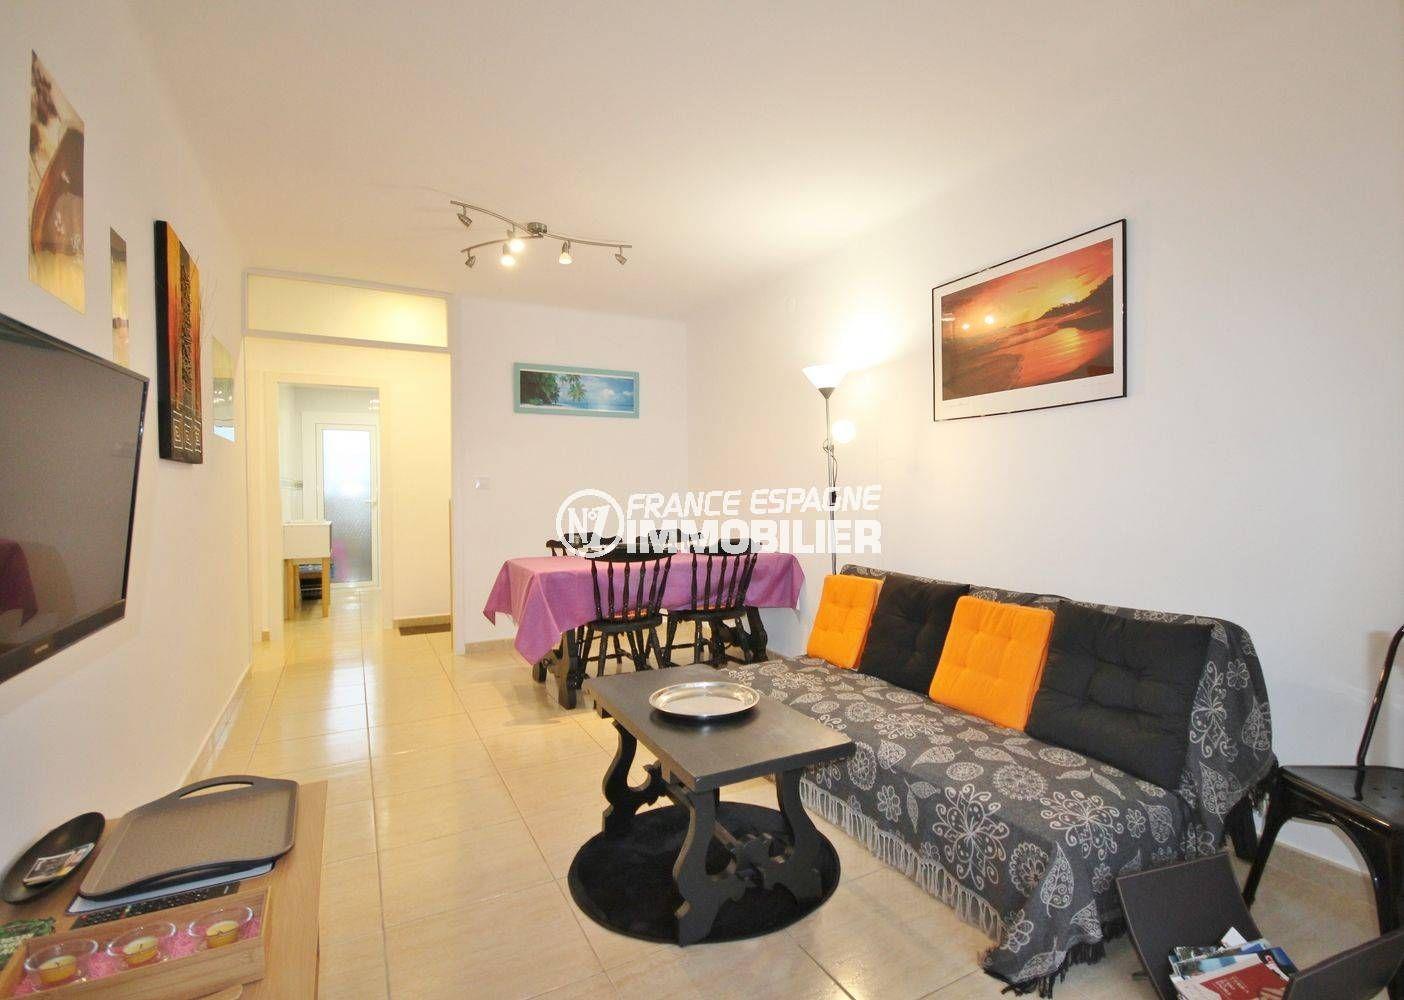 Appartement Proche Plage: Agence Immobiliere Rosas Santa Margarita: Appartement